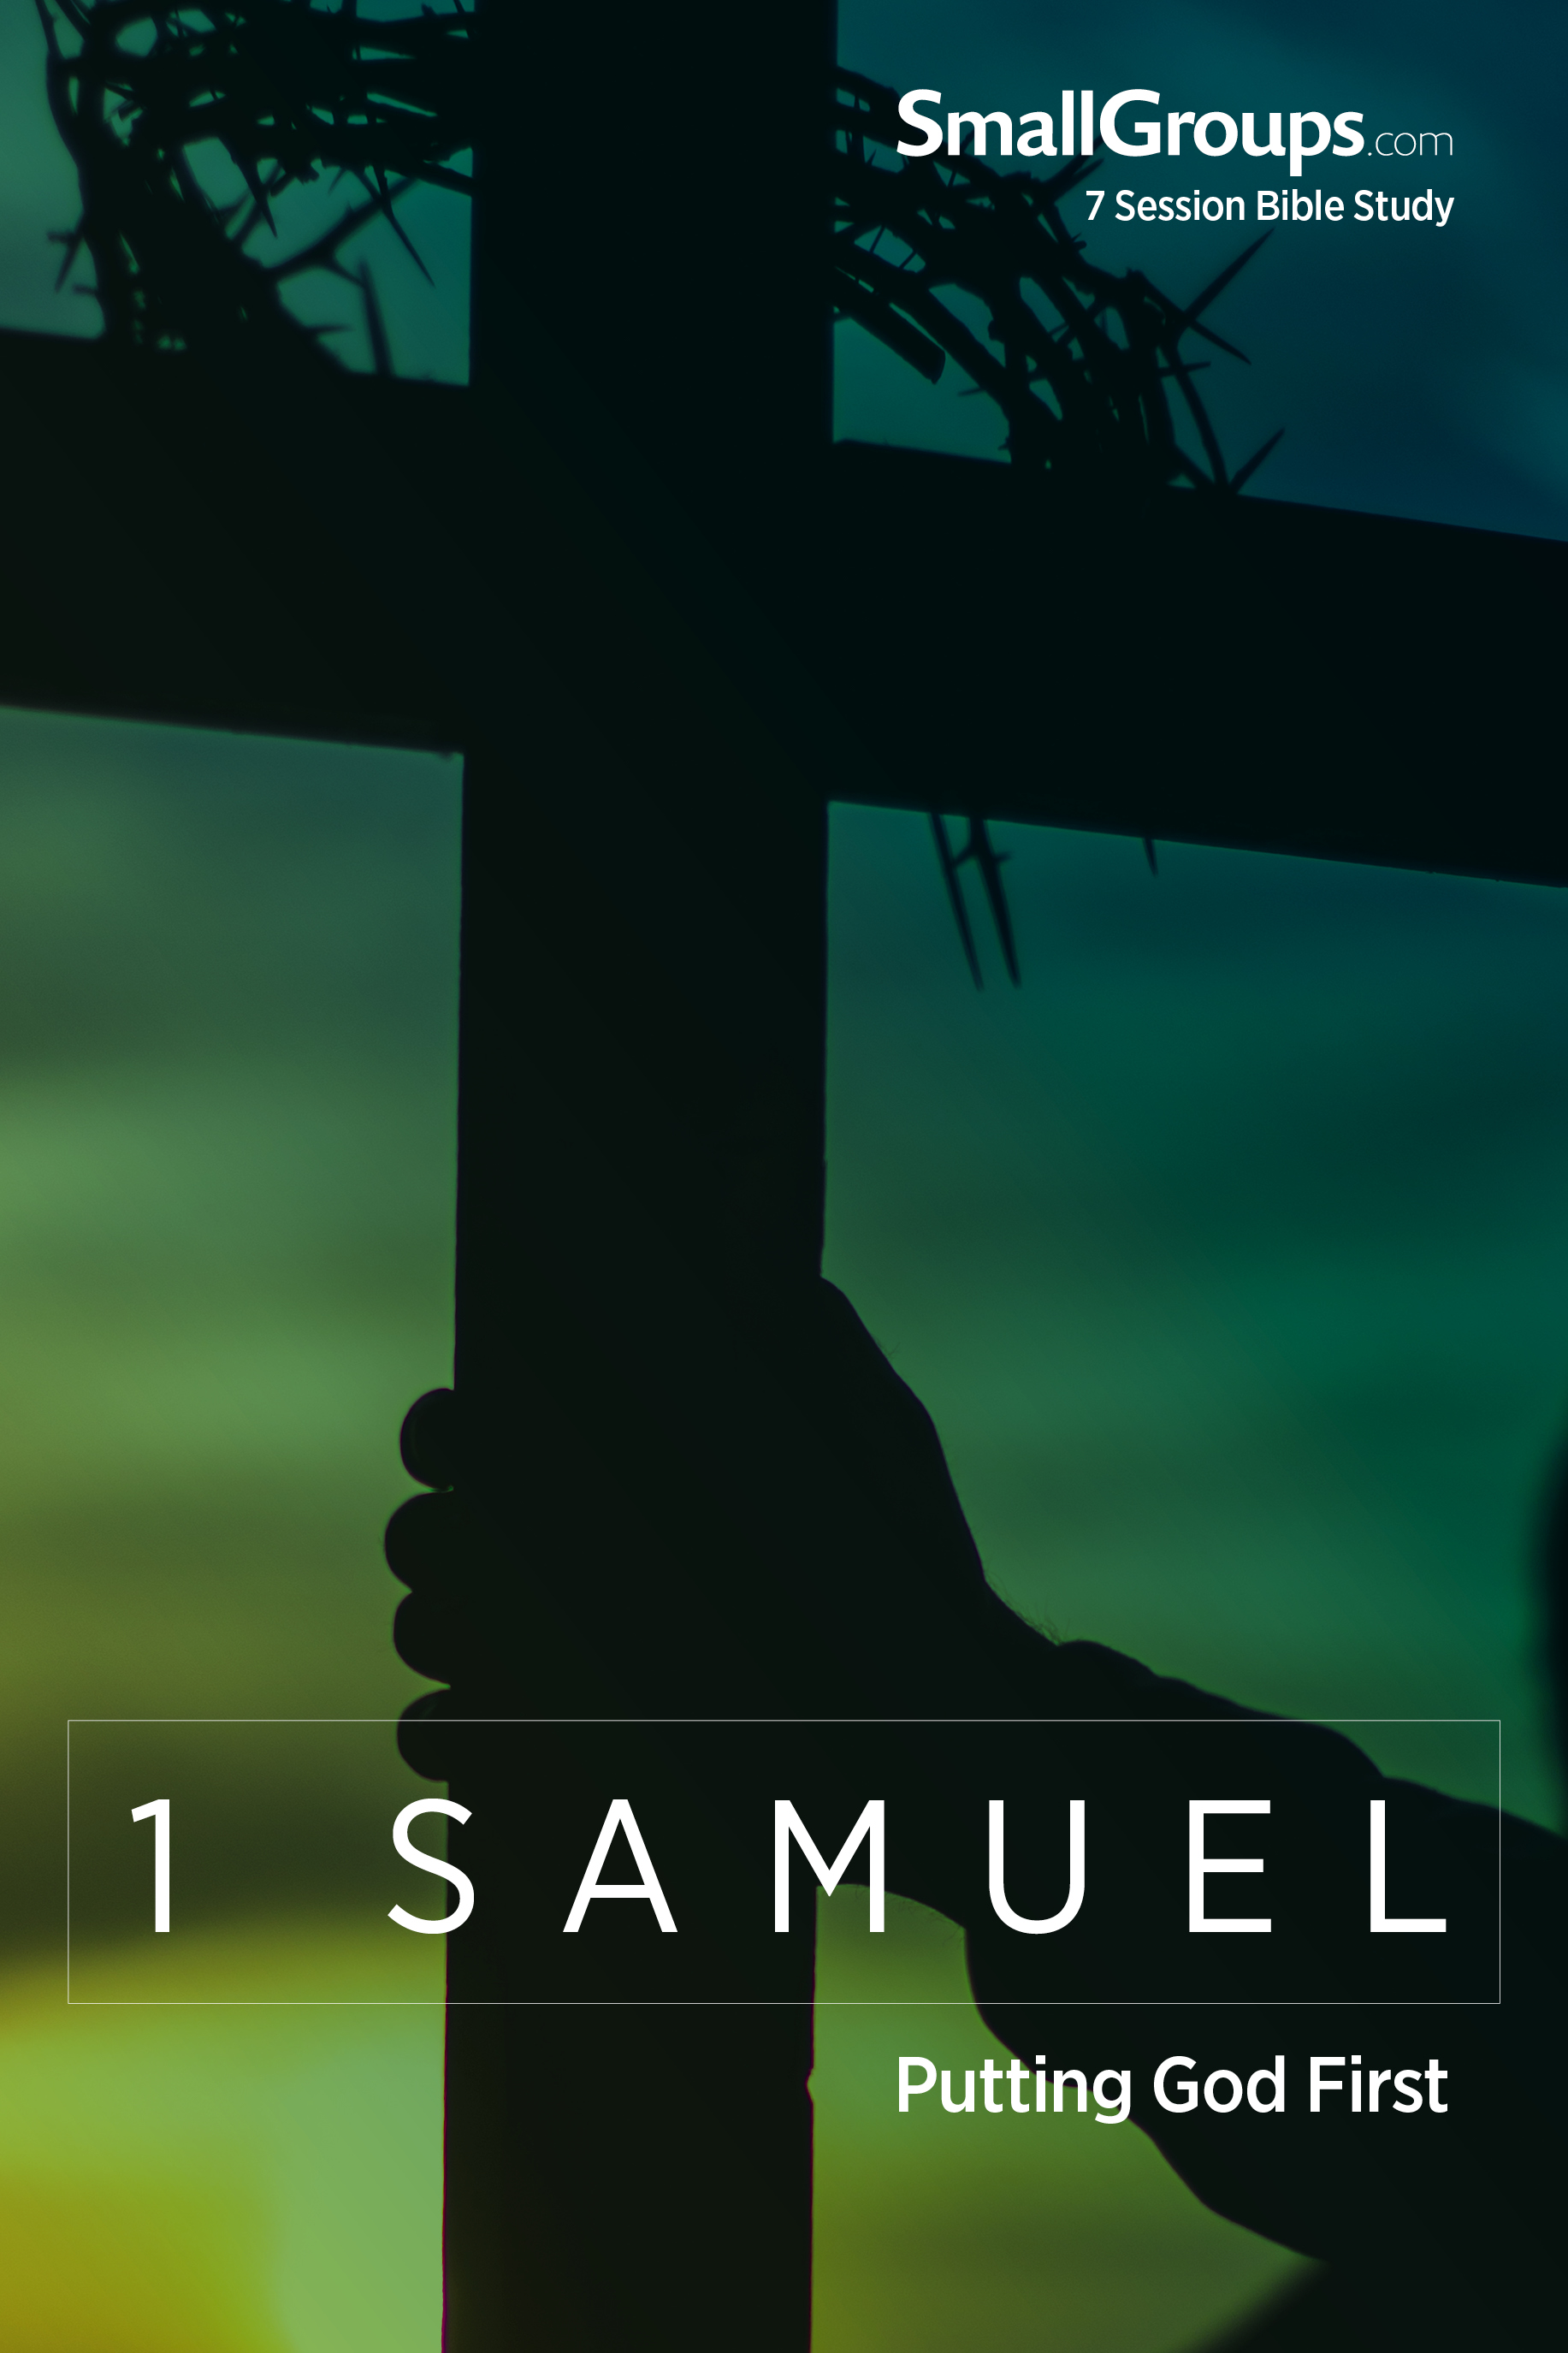 1 Samuel: Putting God First (7 session study)